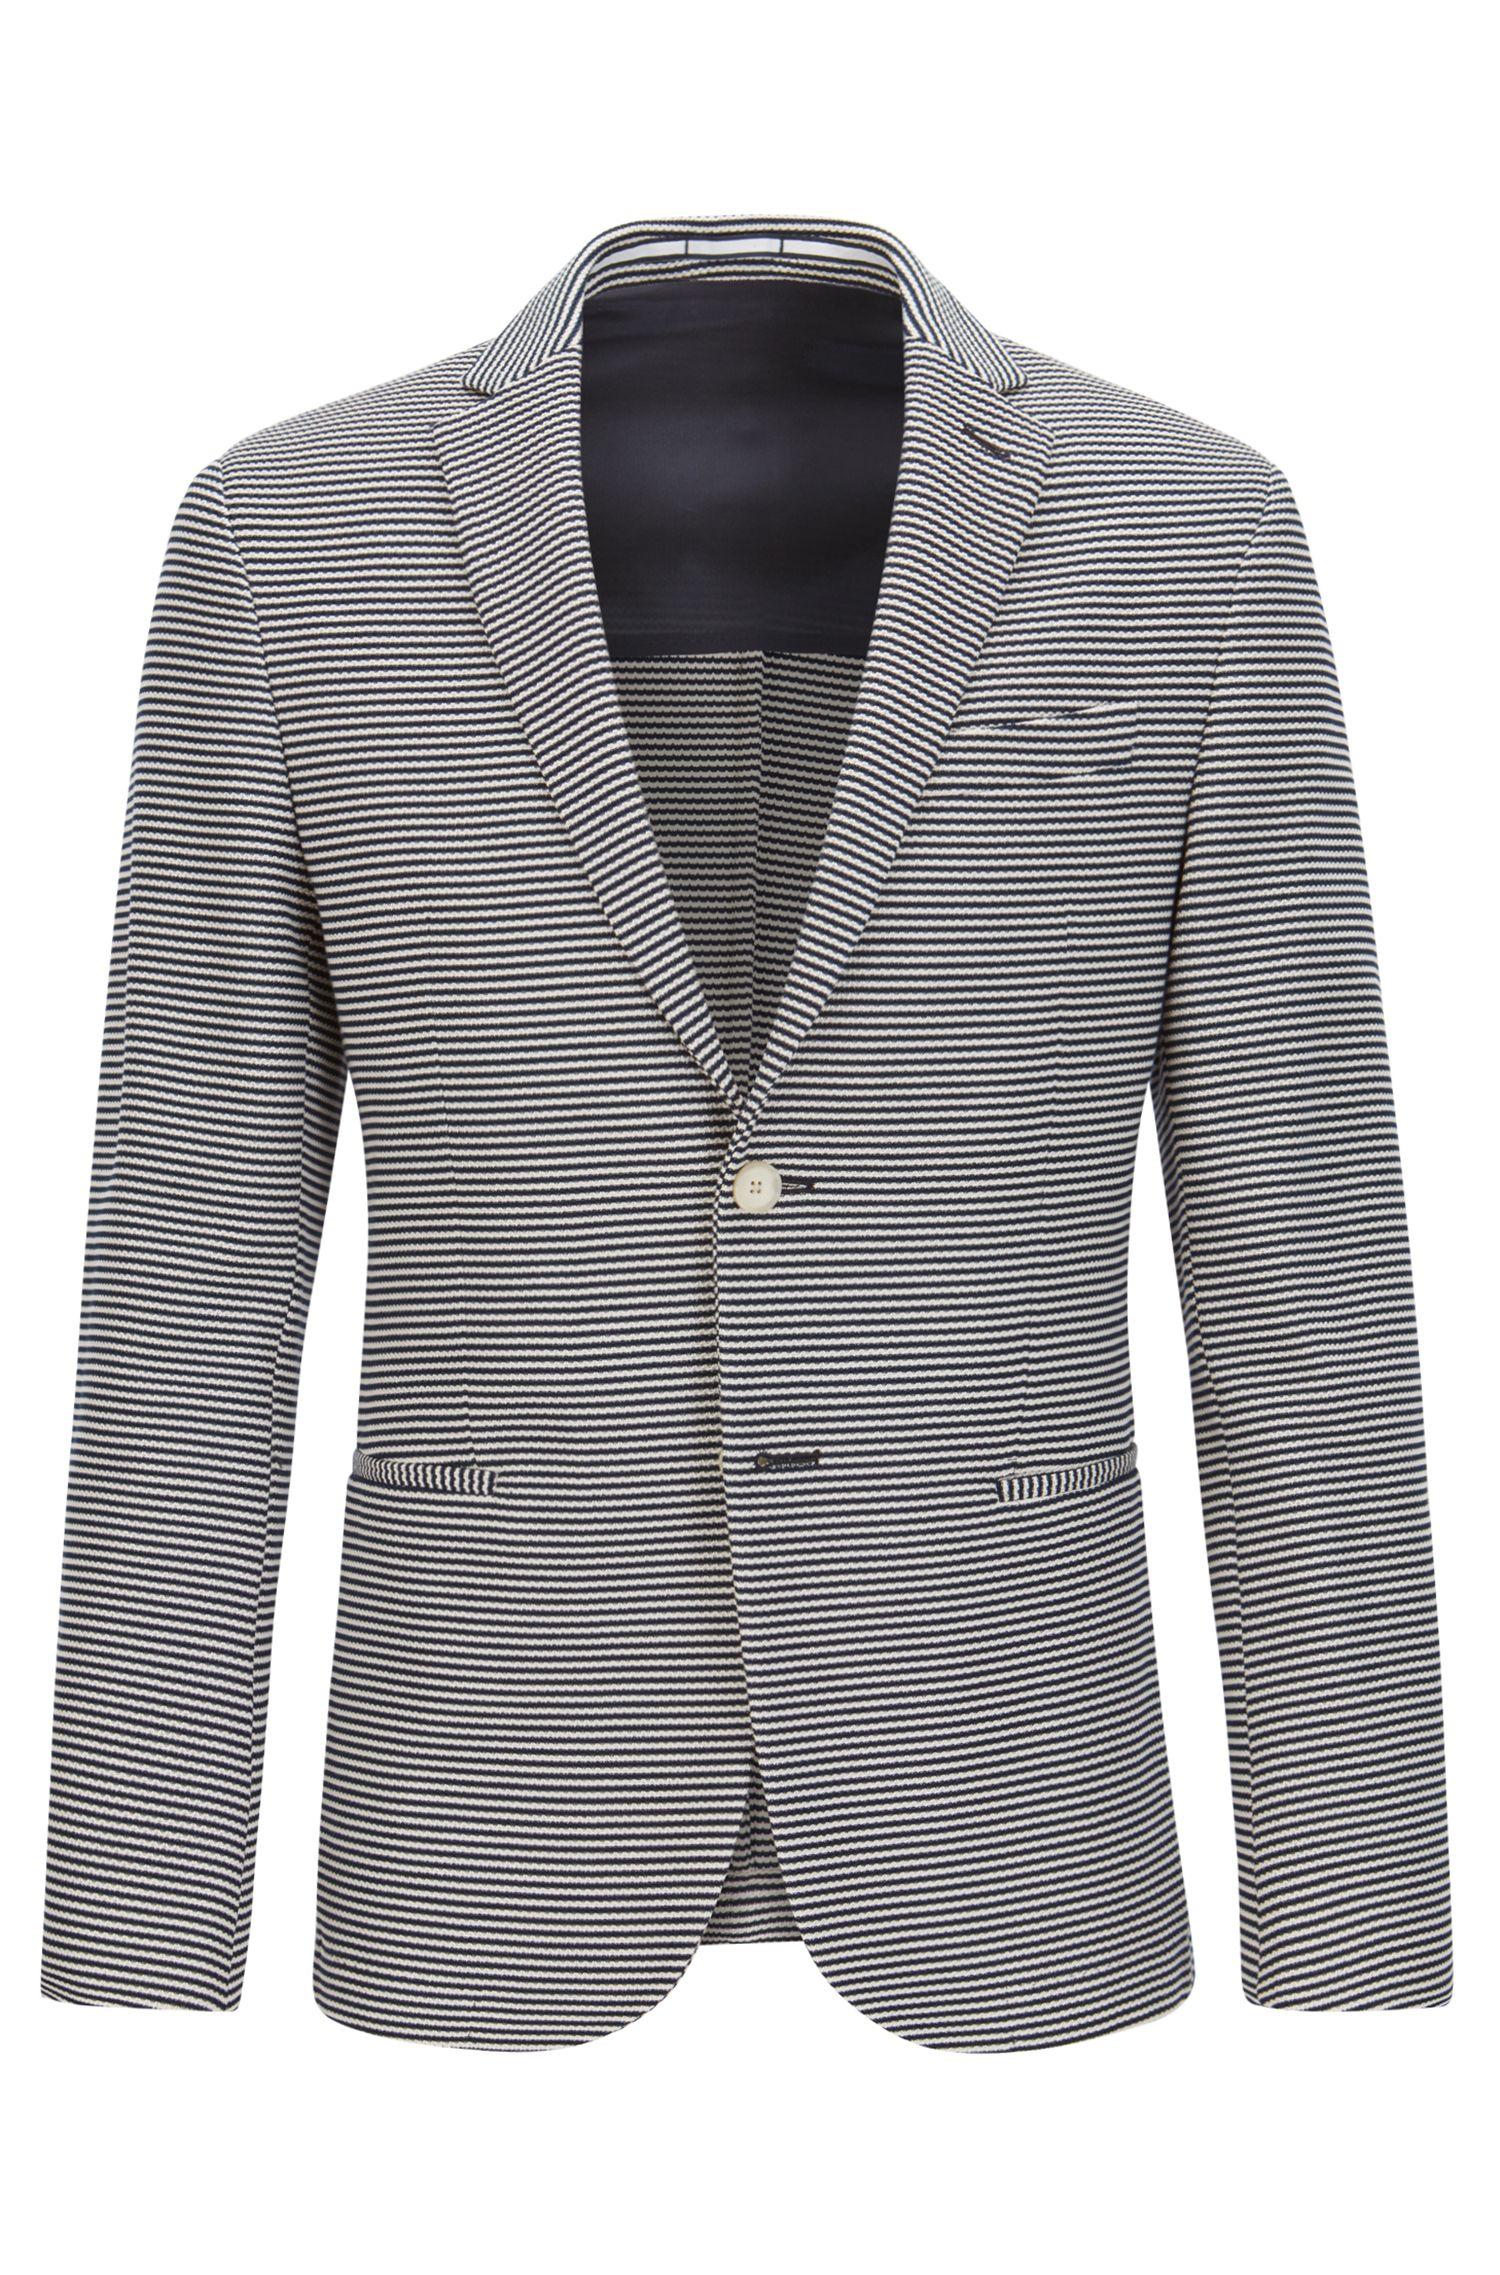 Striped Cotton Sport Coat, Slim Fit   Norwin J